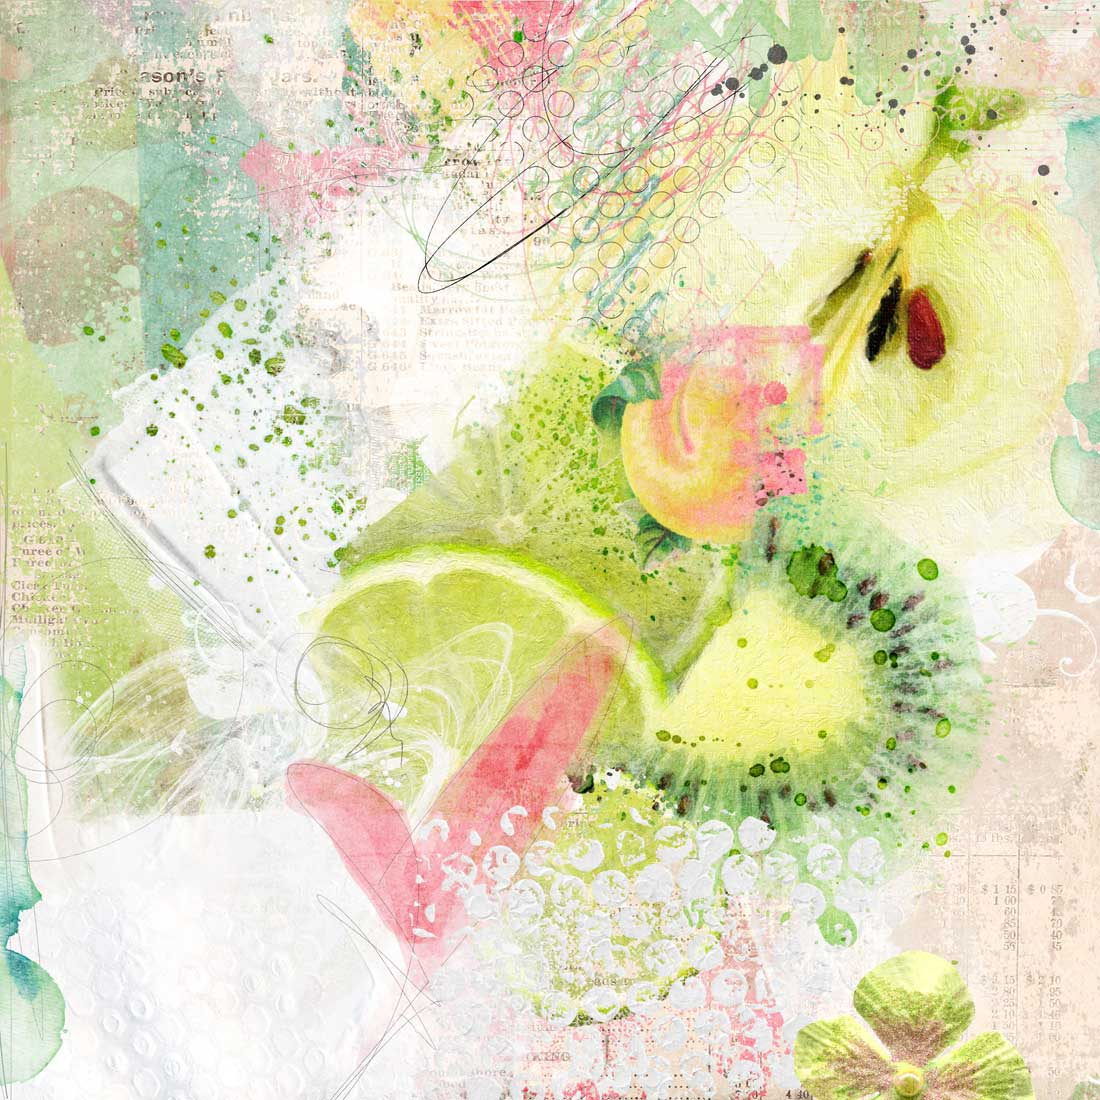 nbk_PL2015_June_Paper_Design_02